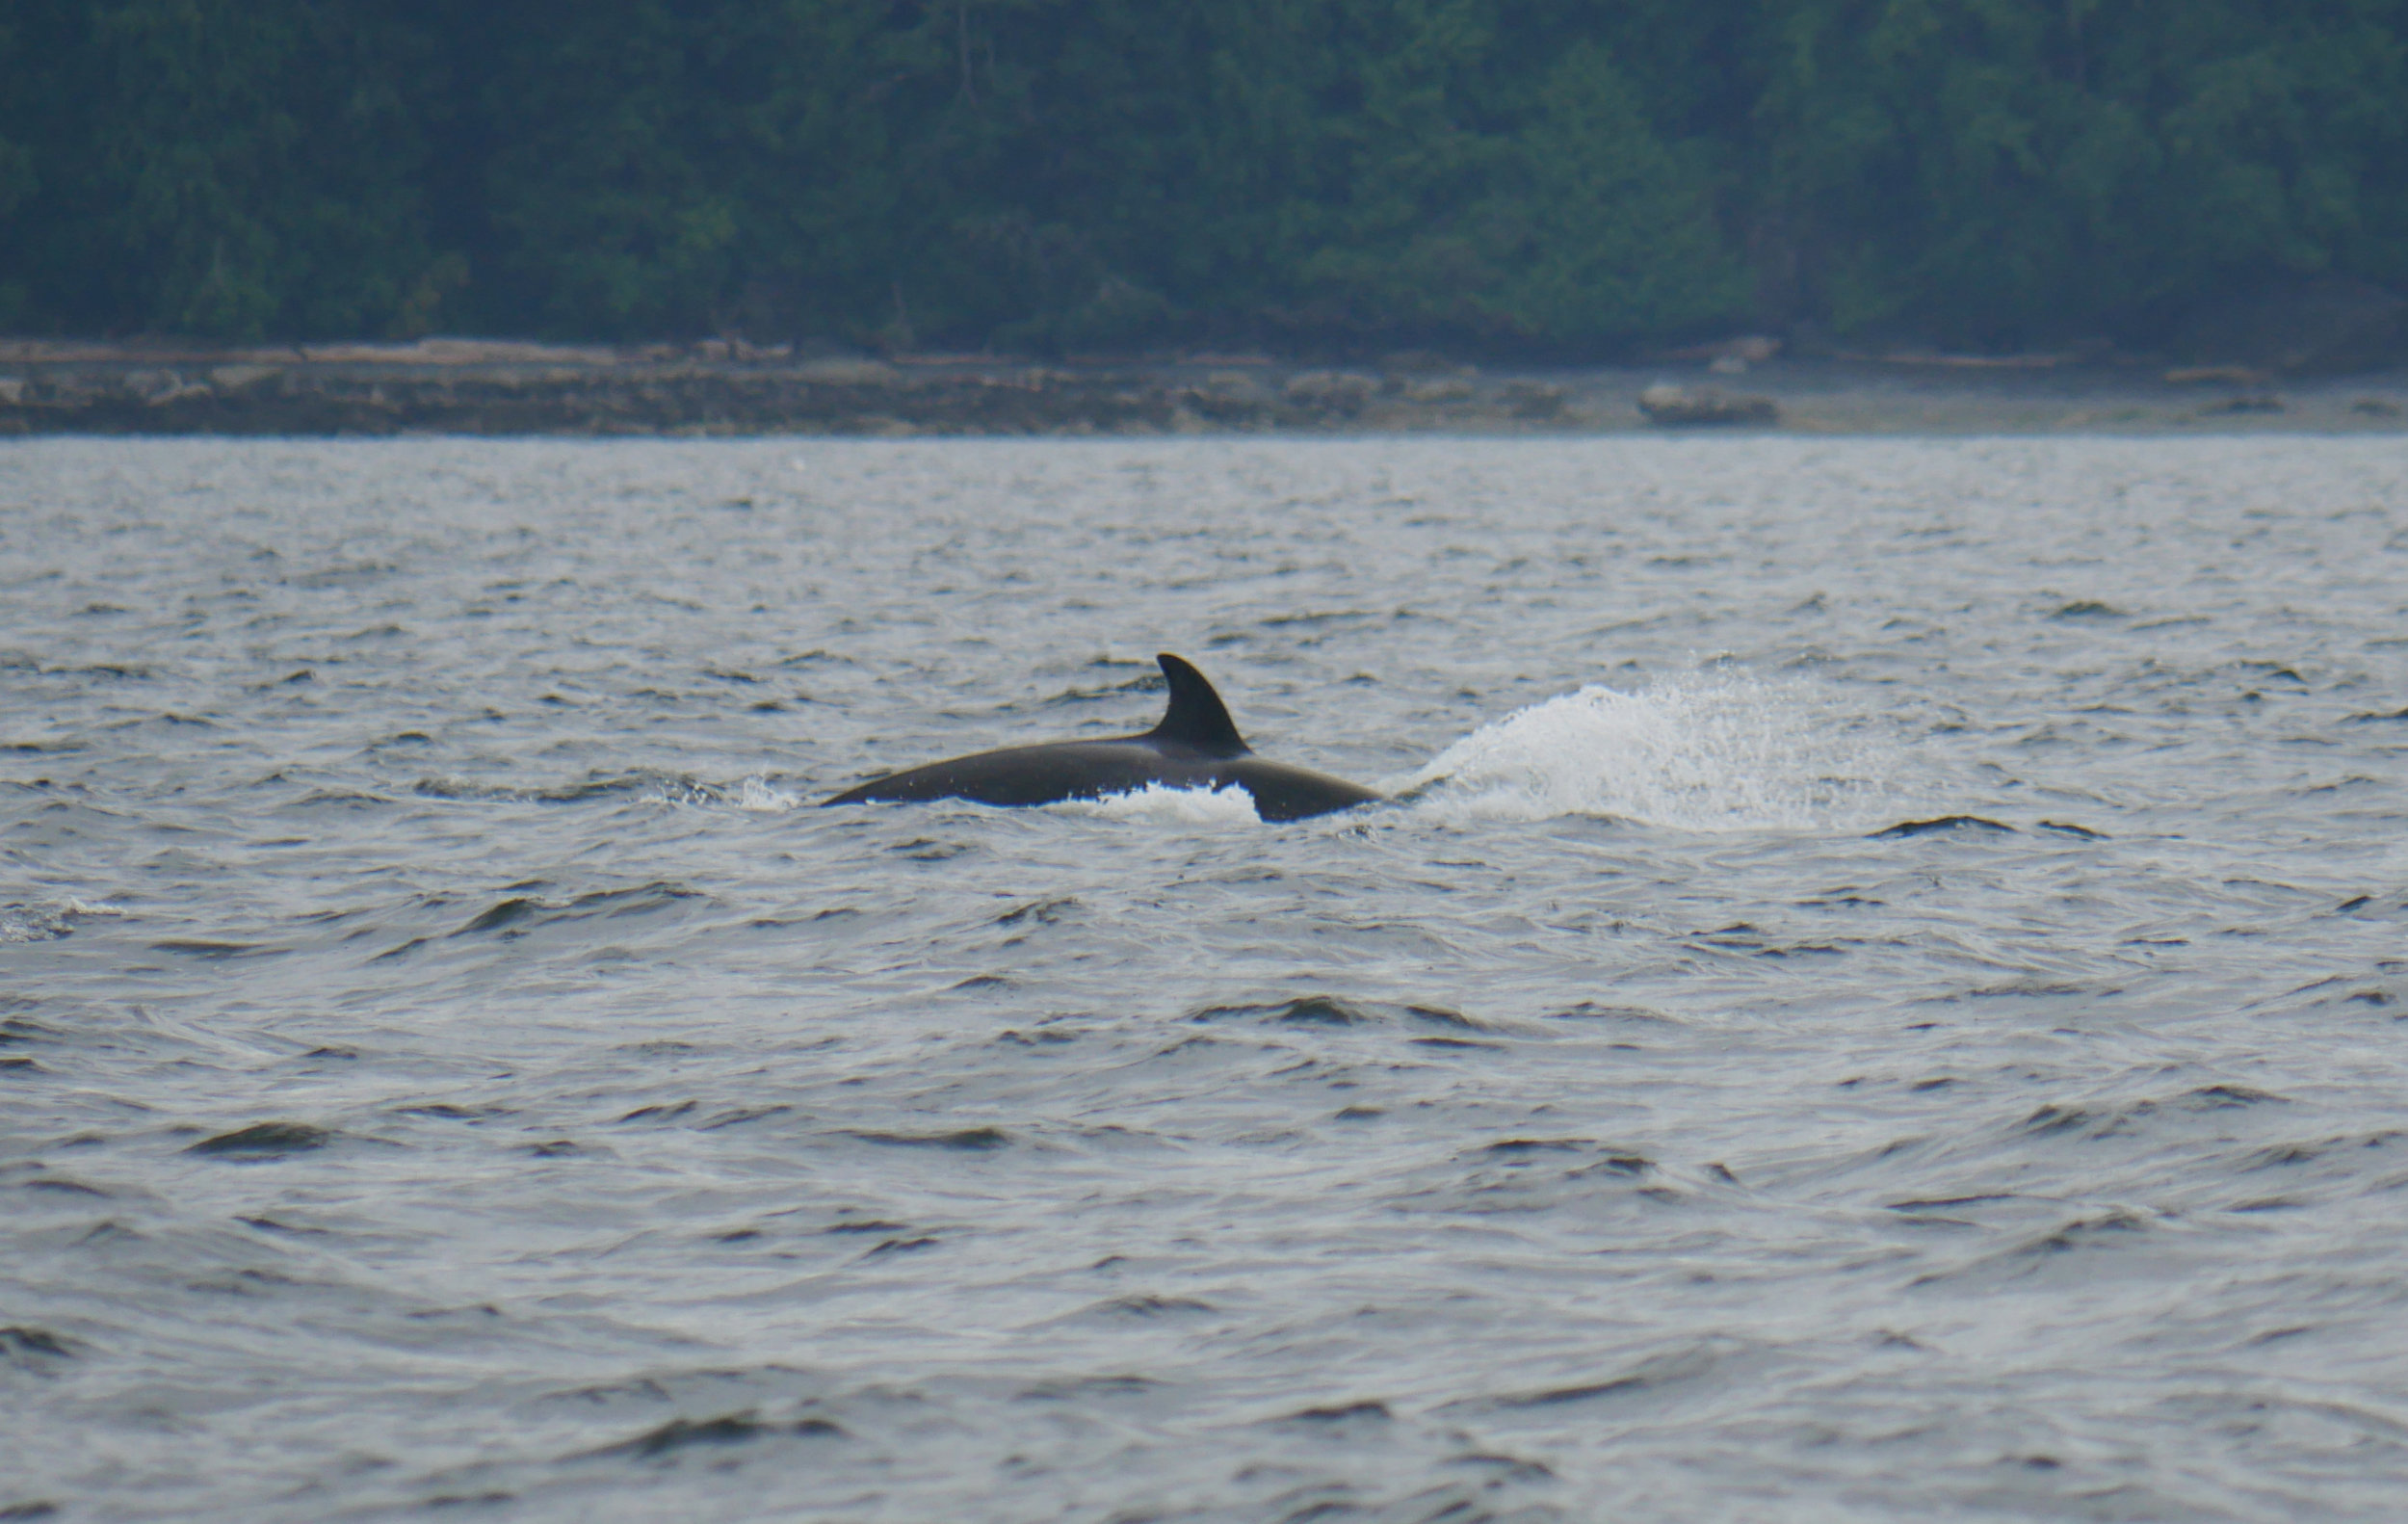 T124A2B cruising through the water. Photo by Ryan Uslu.